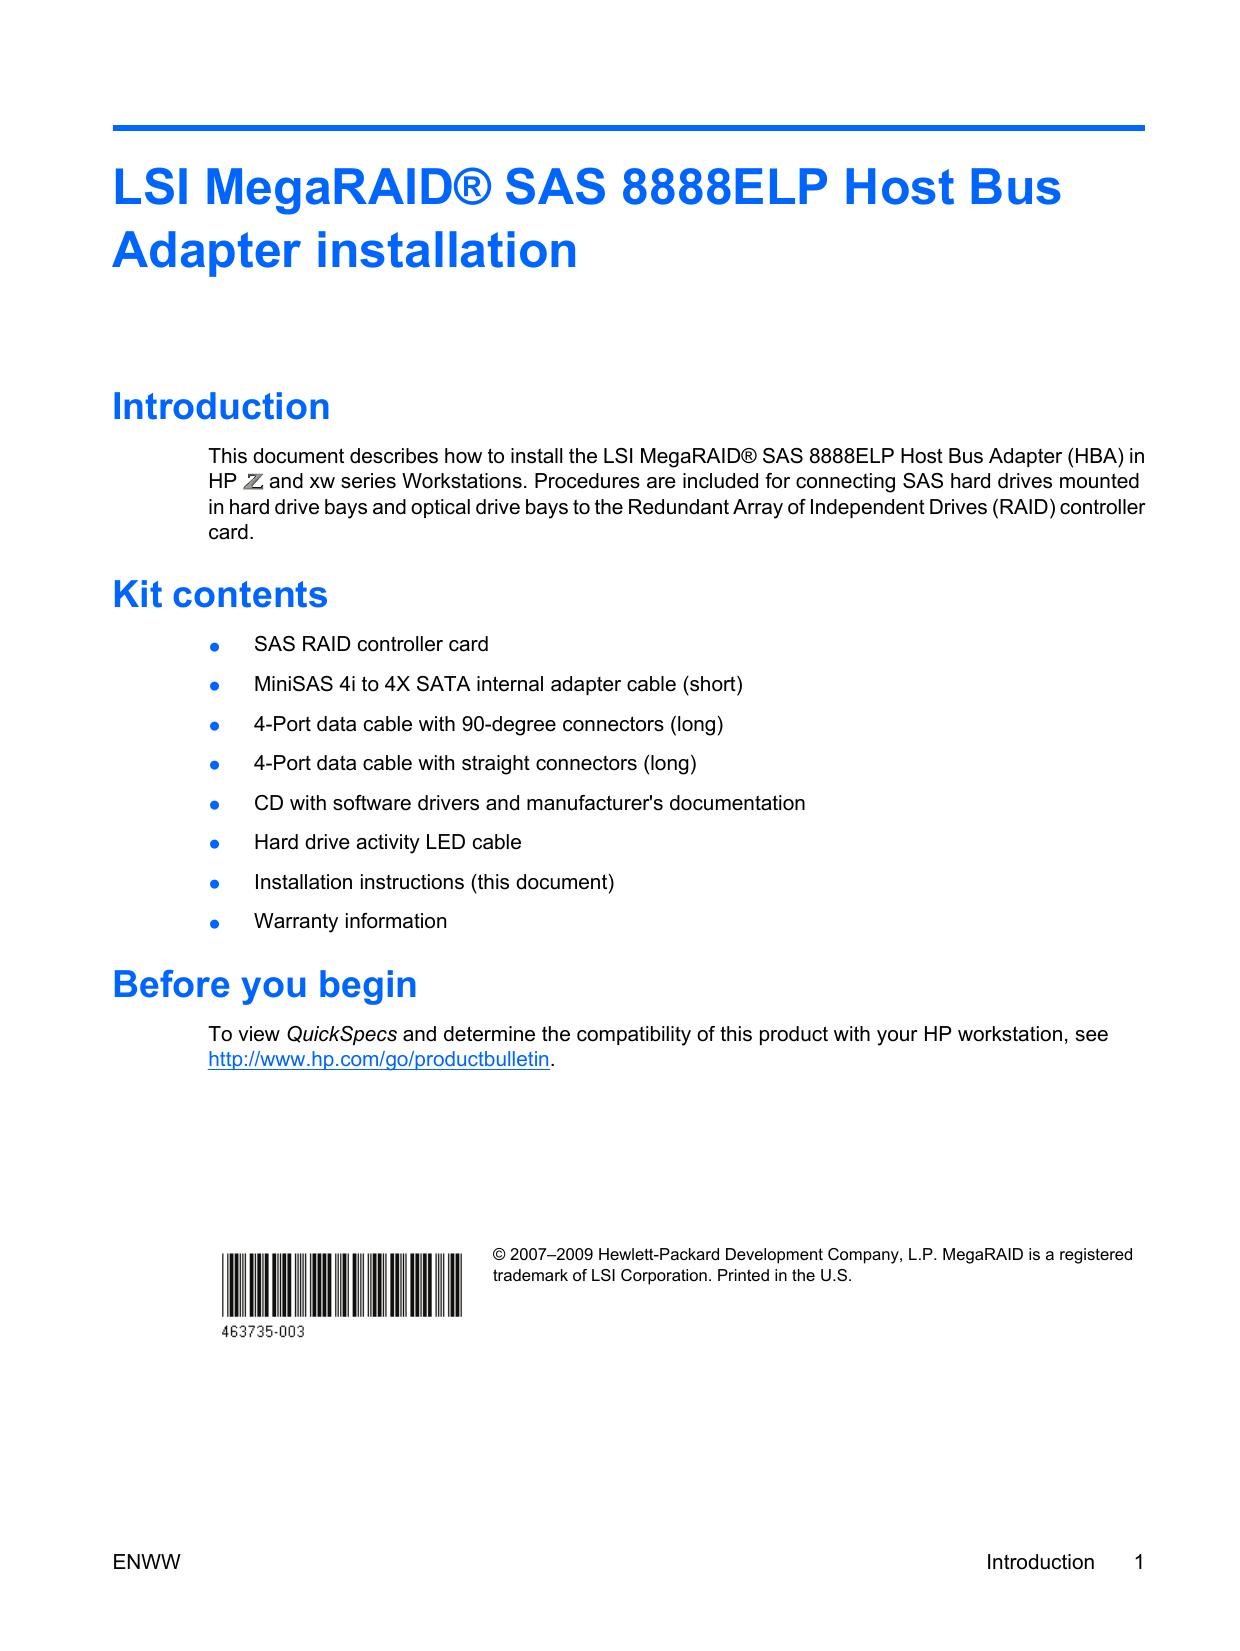 LSI MegaRAID® SAS 8888ELP Host Bus Adapter installation